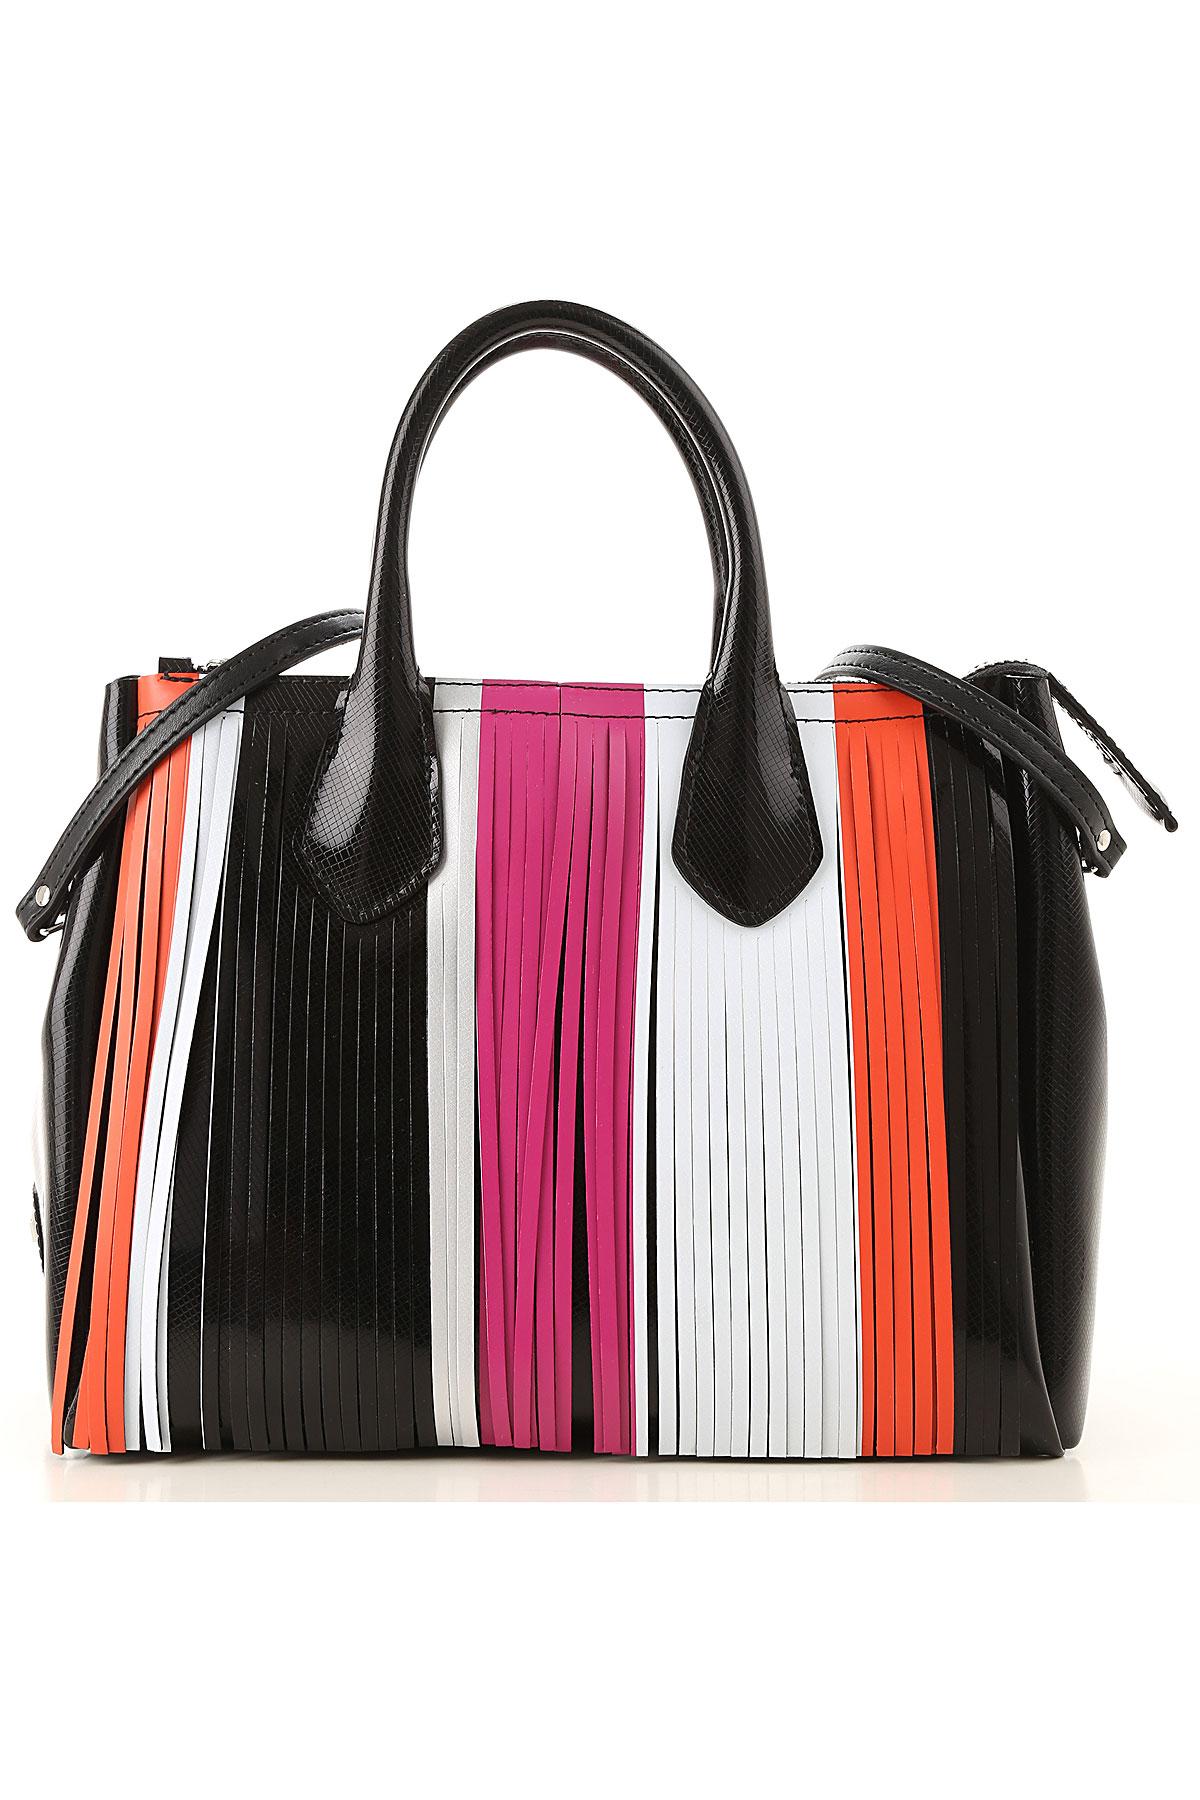 GUM Gianni Chiarini Design Top Handle Handbag On Sale in Outlet, Black, PVC, 2019